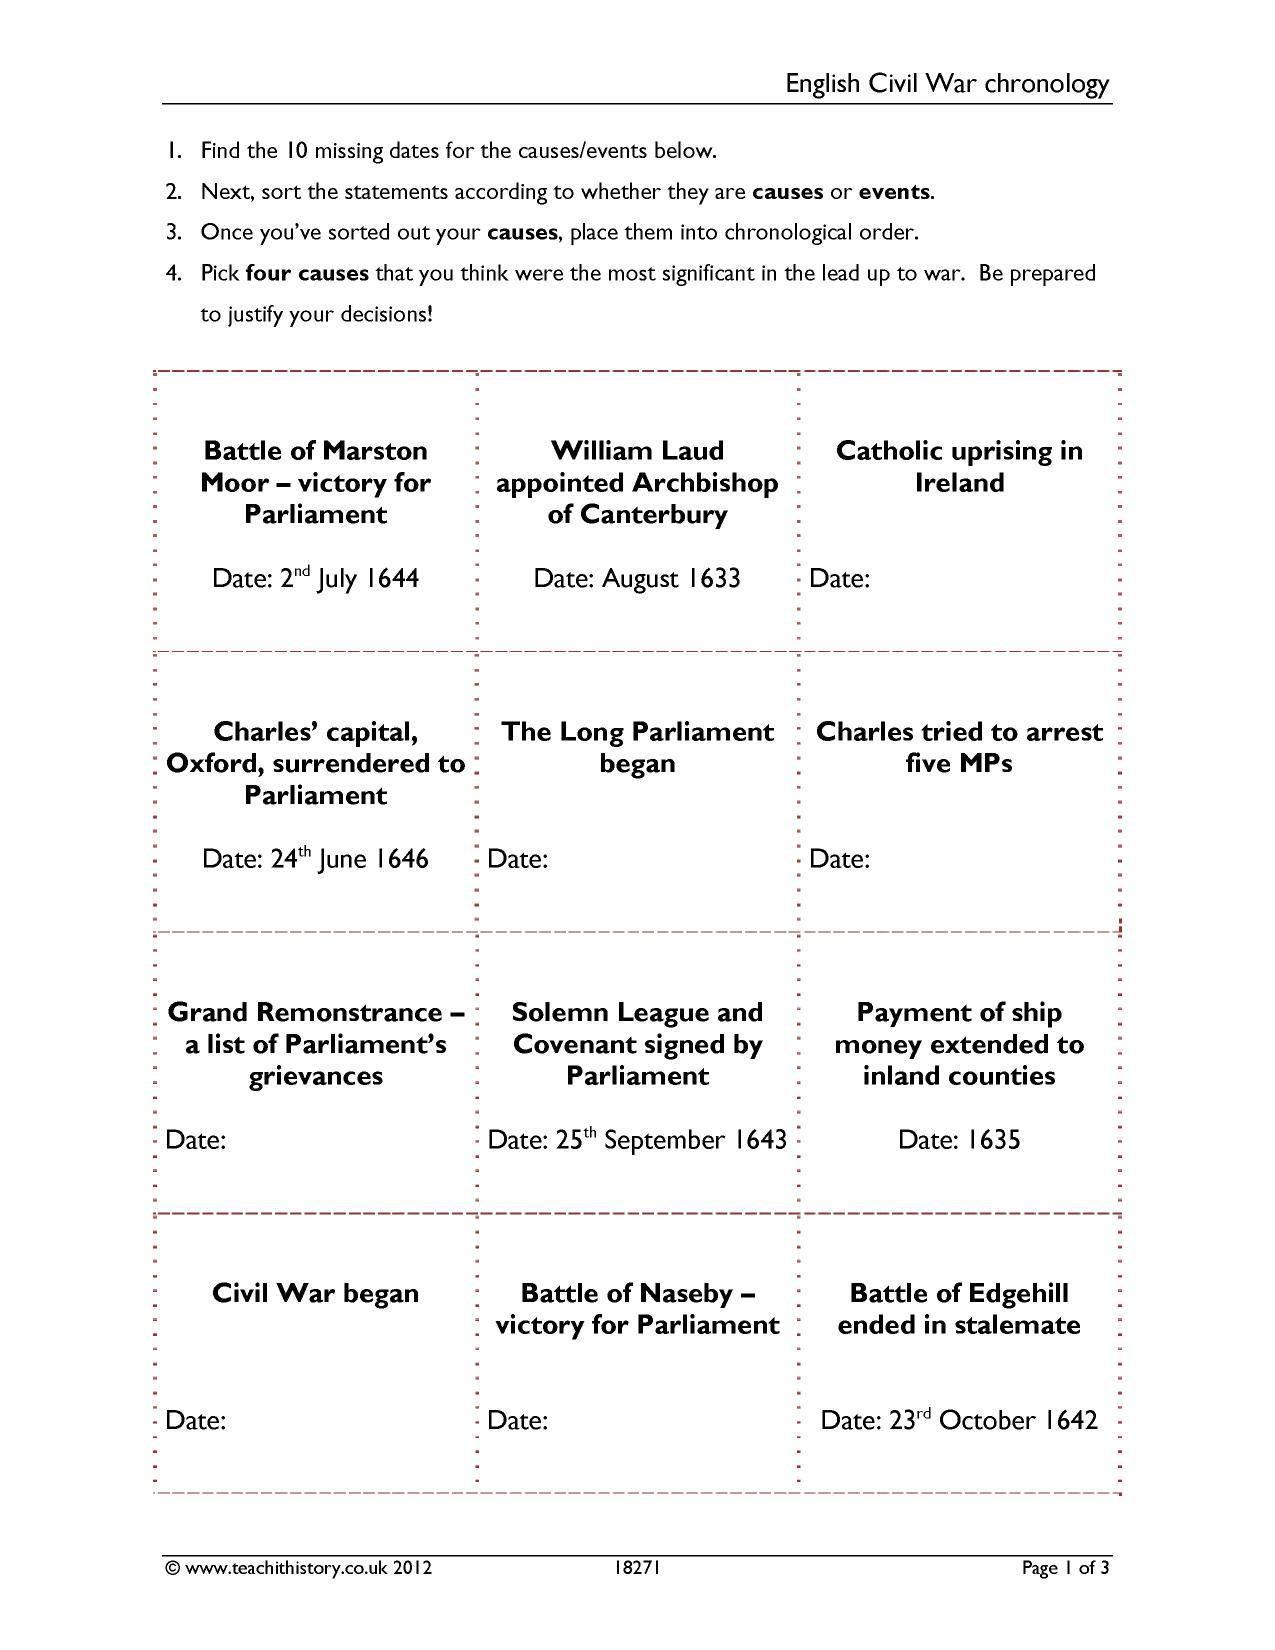 Civil War Timeline Worksheet Ks3 the English Civil War